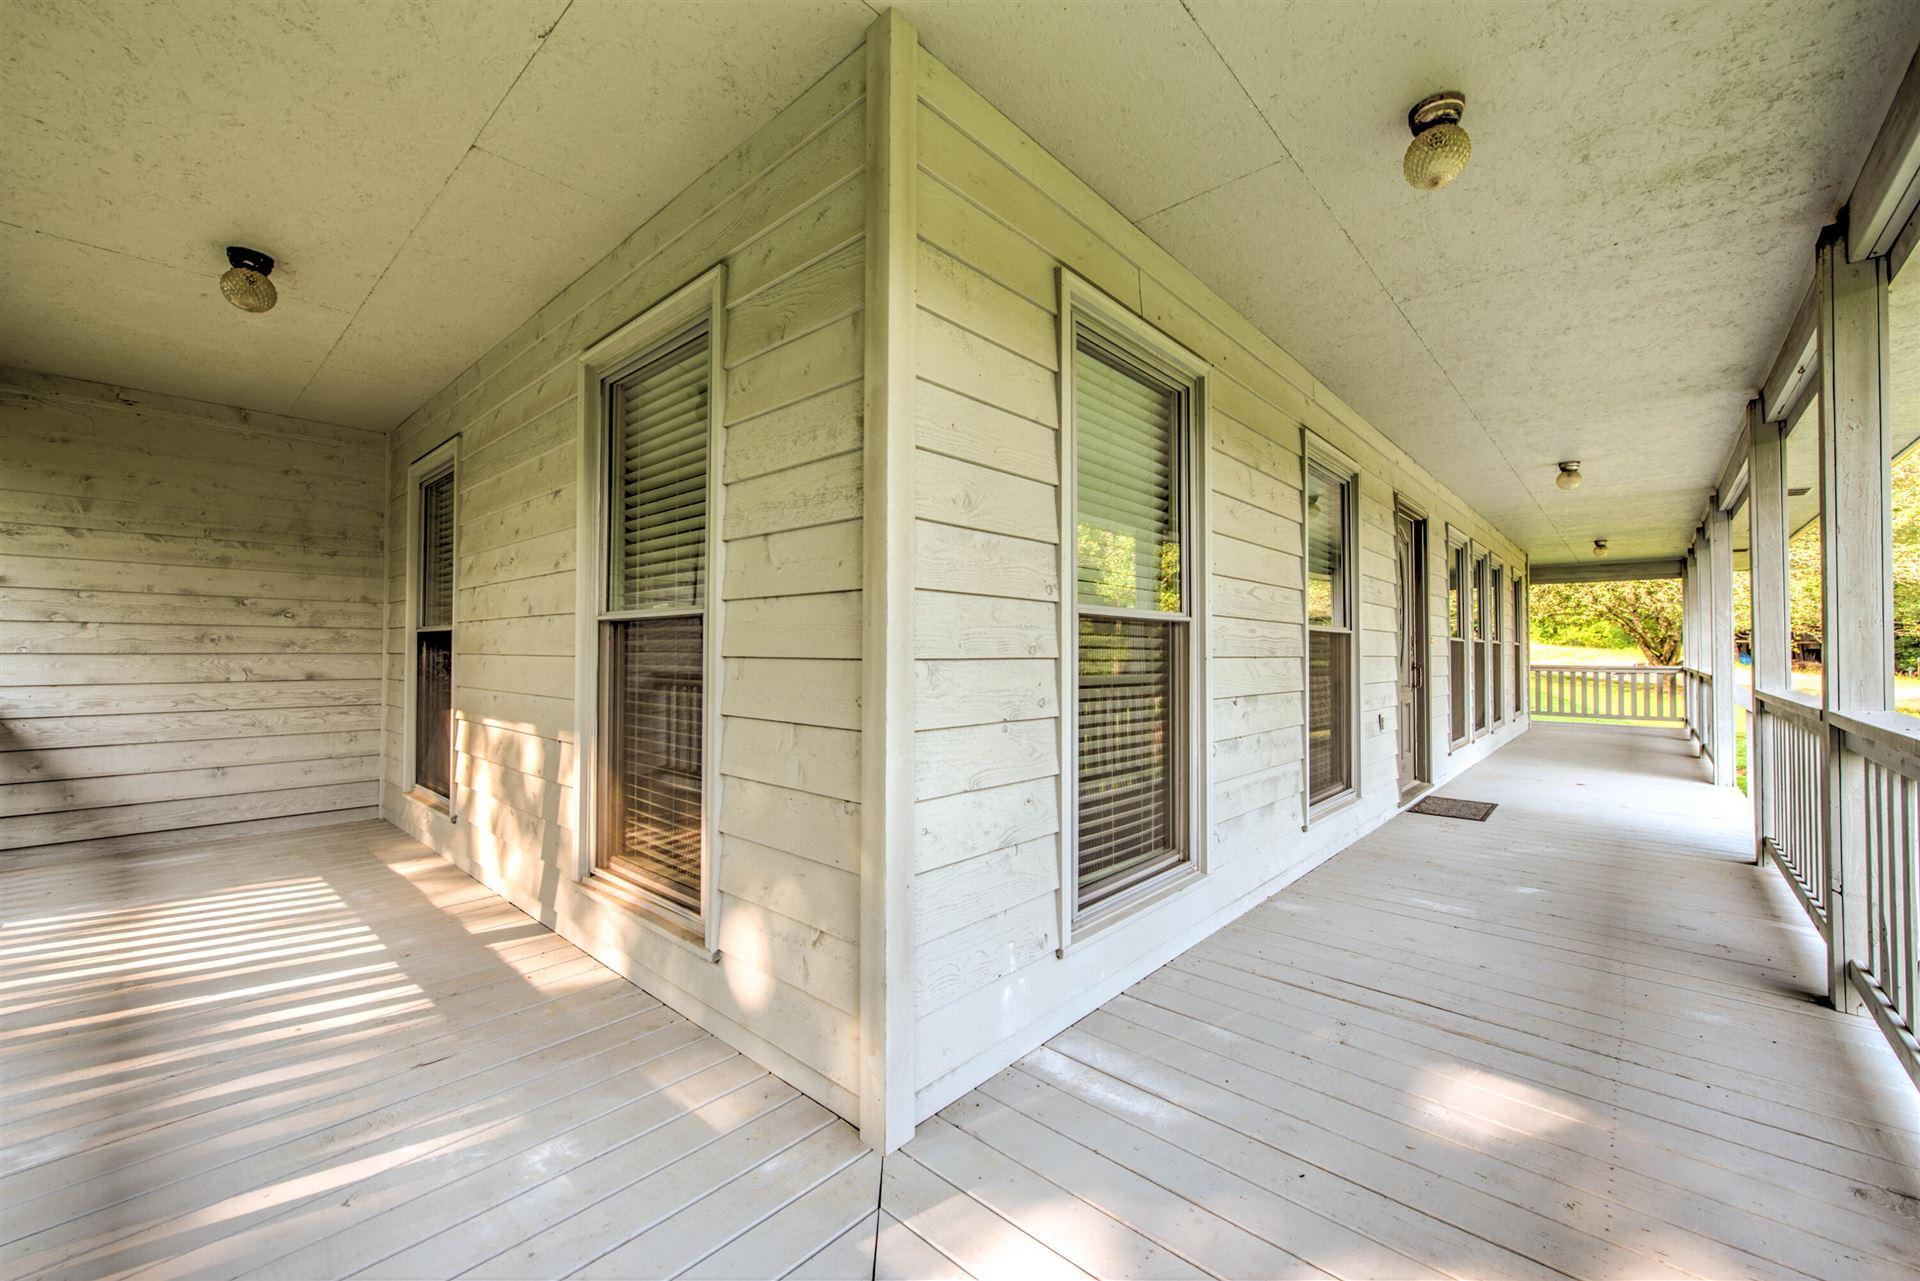 Photo of 813 Blockhouse Valley Rd, Clinton, TN 37716 (MLS # 1161169)